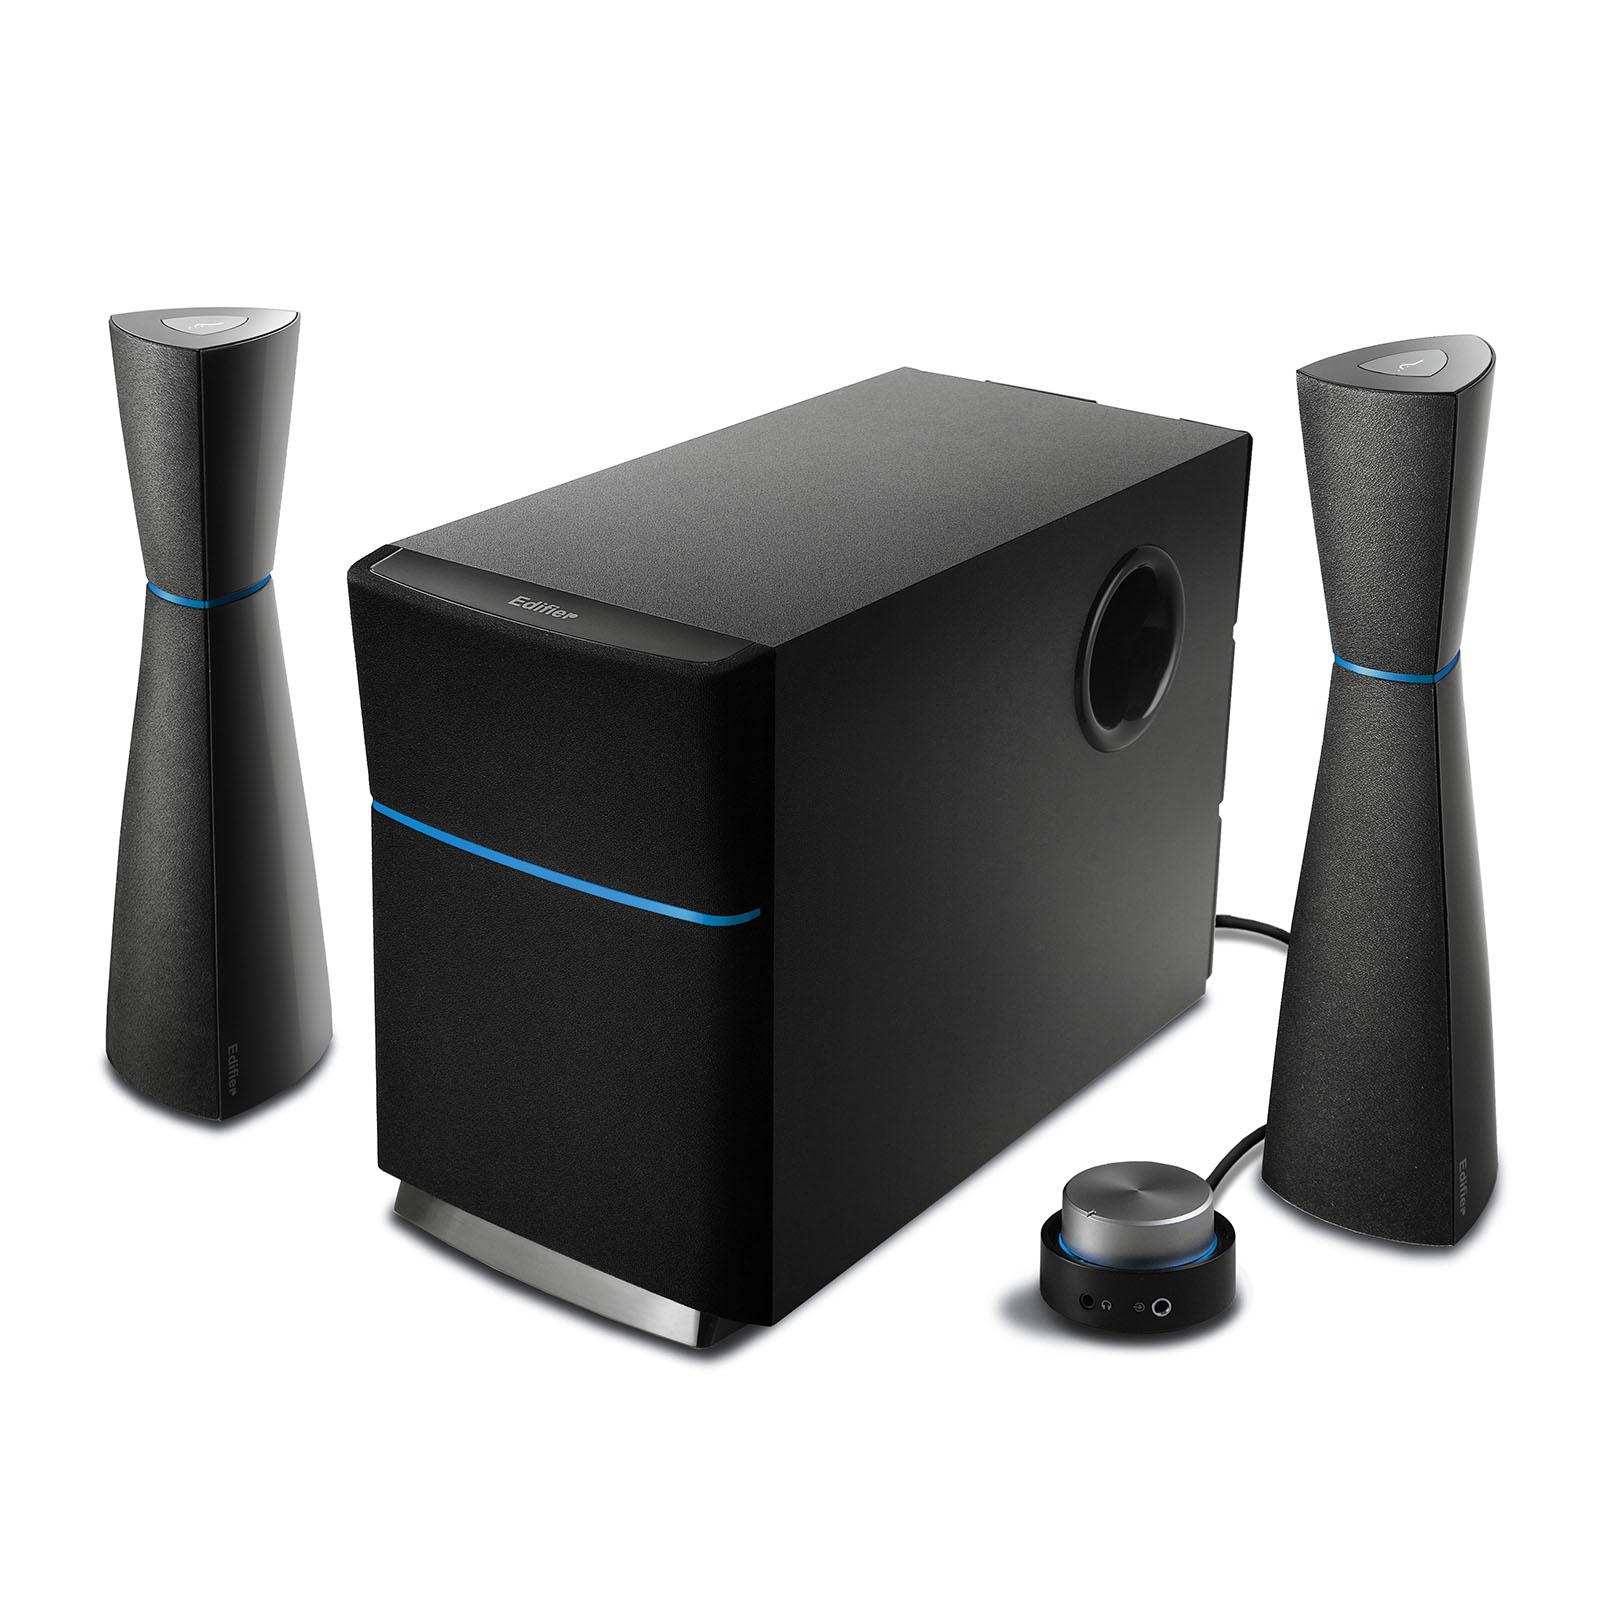 m3200 2 1 multimedia audio speaker system edifier canada. Black Bedroom Furniture Sets. Home Design Ideas